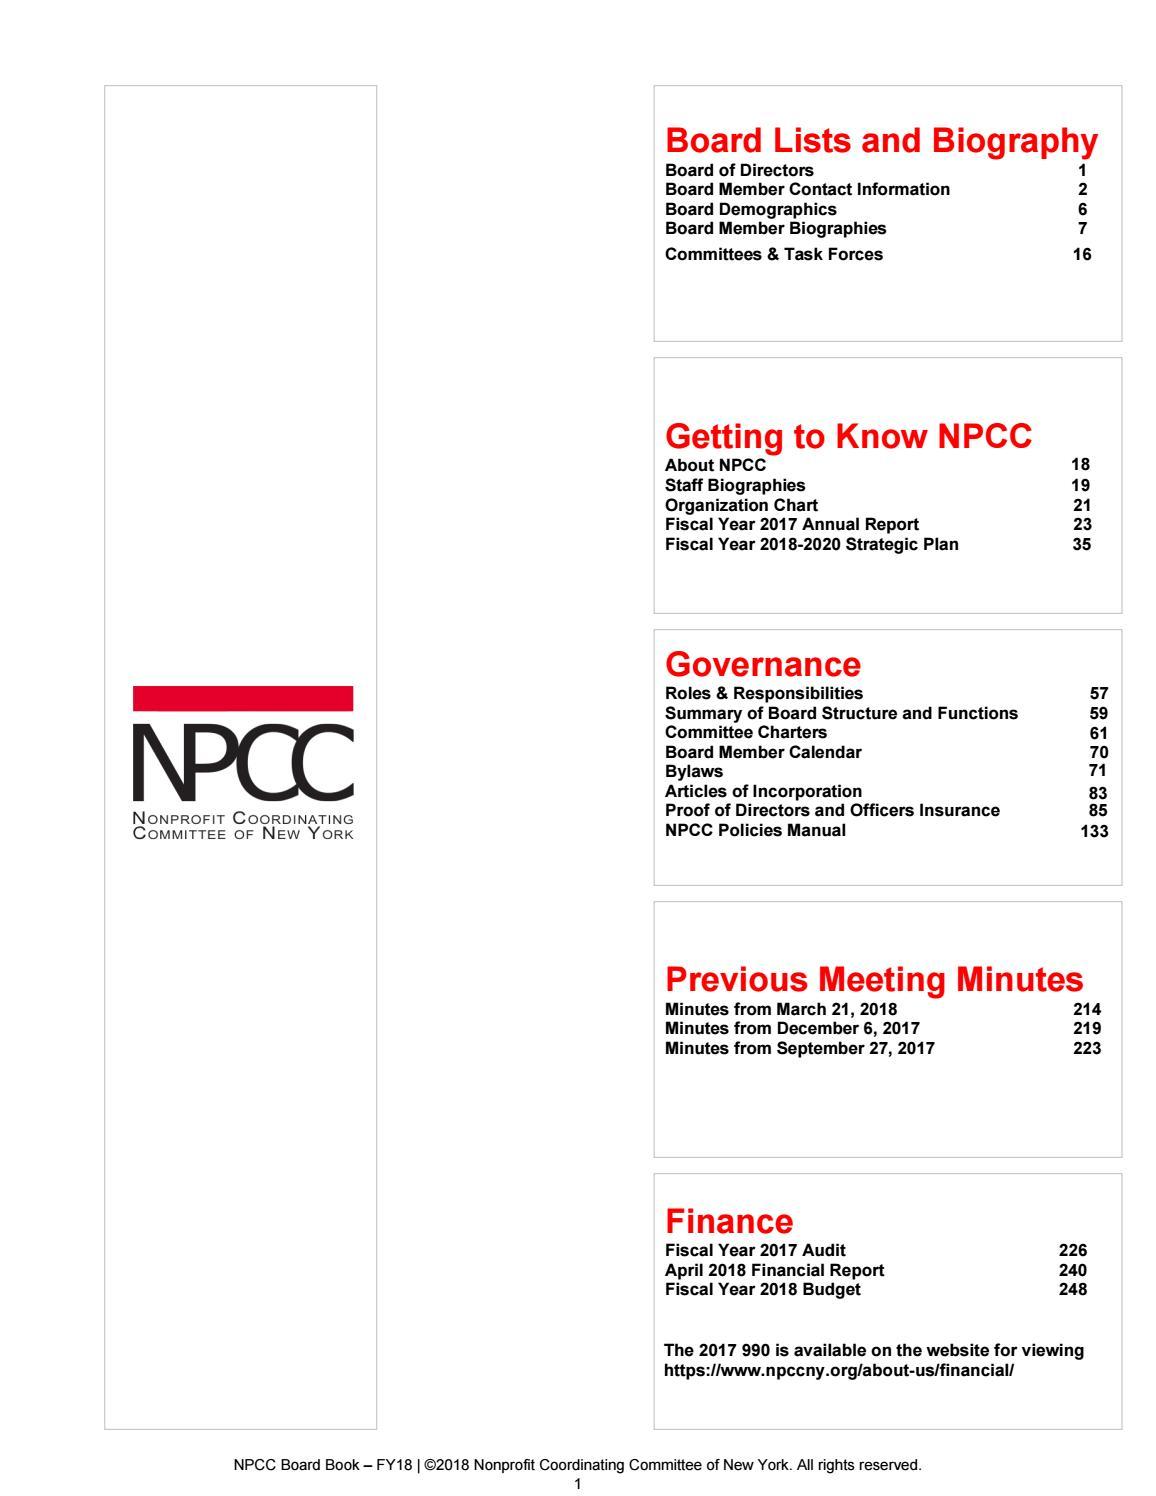 NPCC Board Book FY18 by NPCCNY5340 - issuu